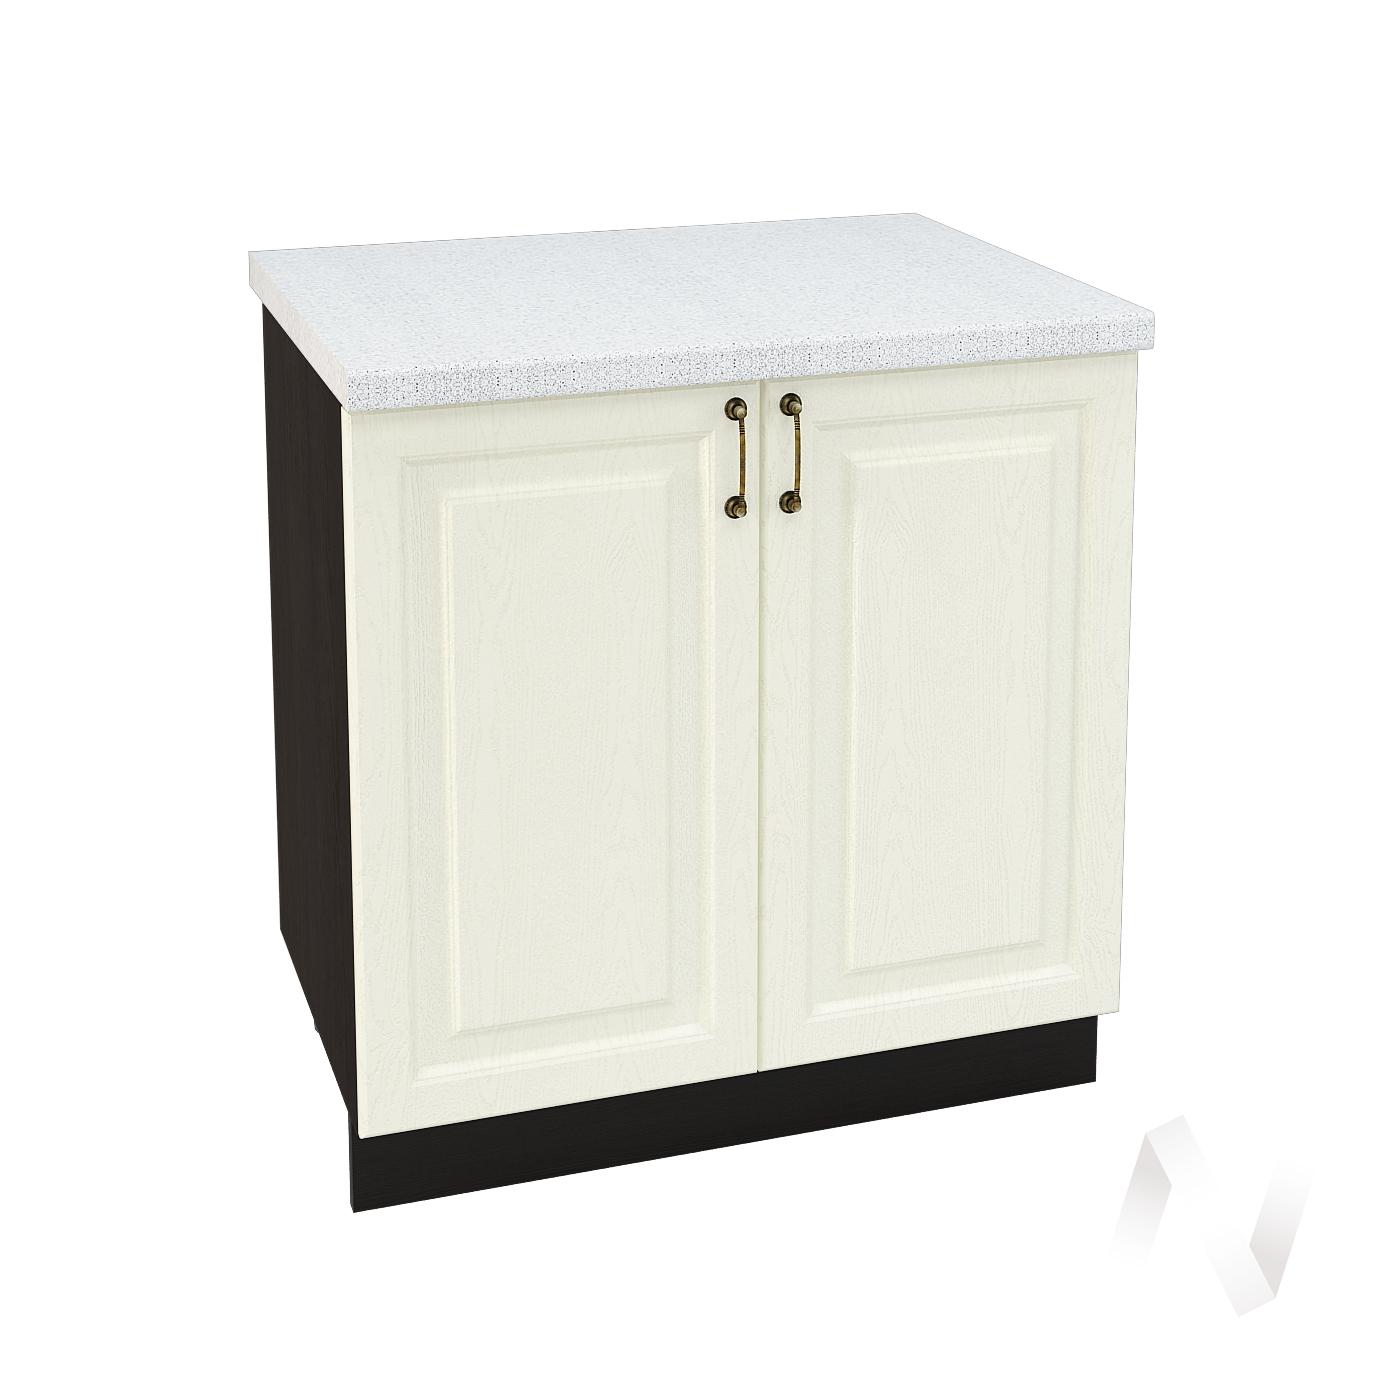 "Кухня ""Ницца"": Шкаф нижний 800, ШН 800 (Крем/корпус венге)"